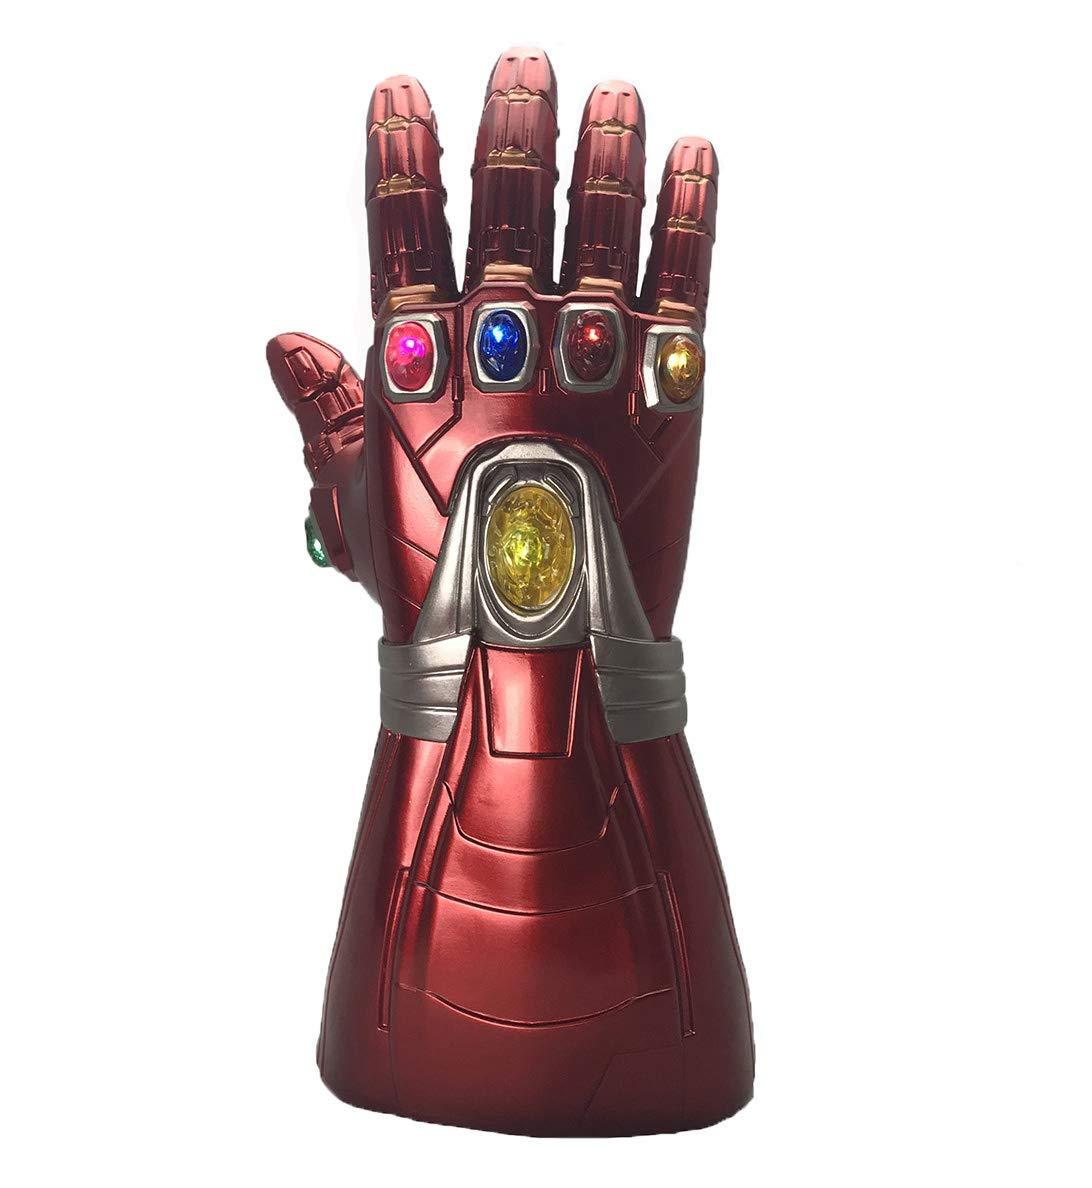 Haho Iron Man Gauntlet Avengers Endgame Iron Man Infinity Stone Gauntlet Glove Light Up (Adult) Red